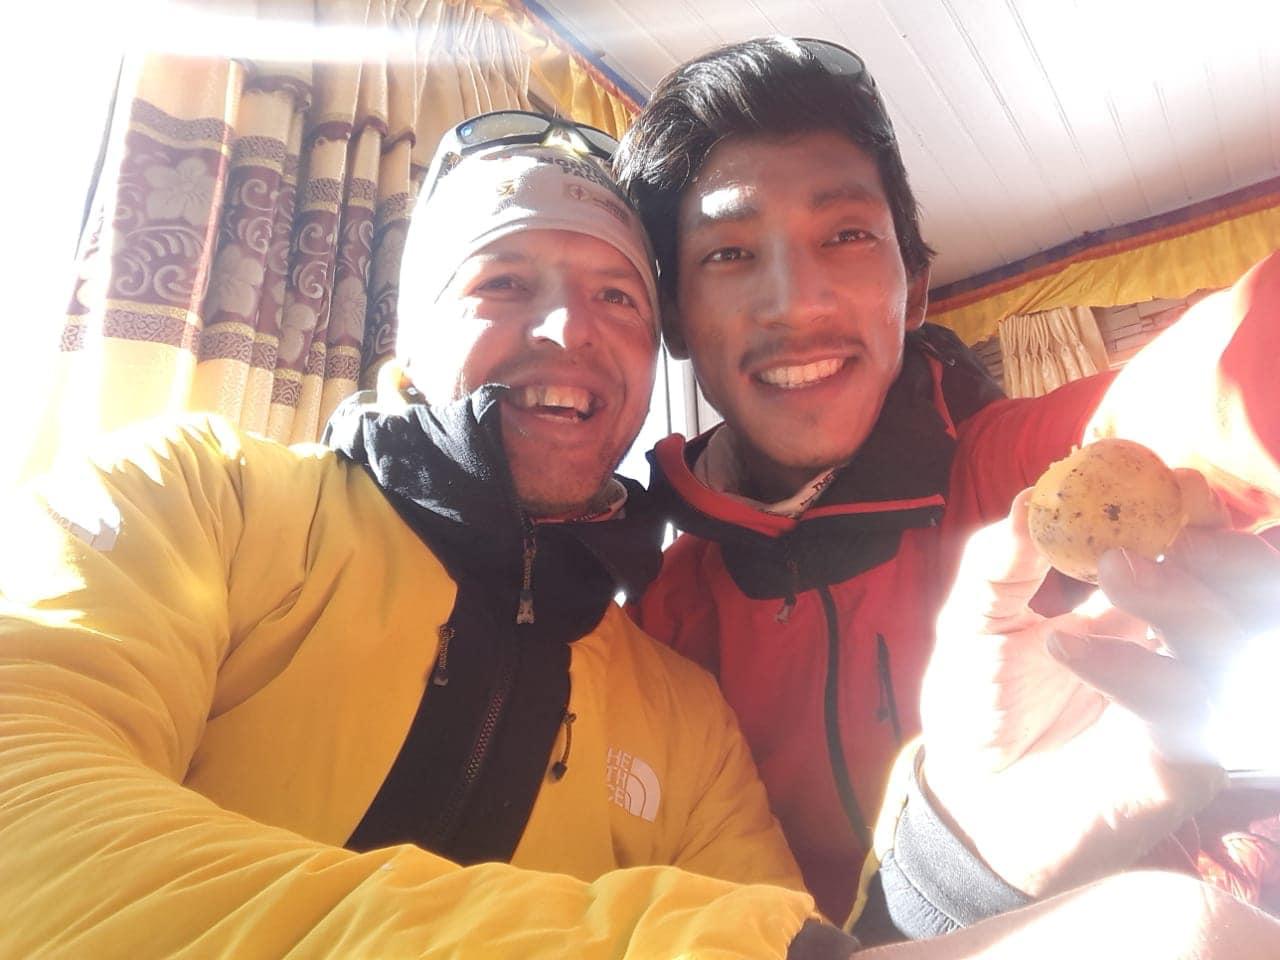 alpinismo, simone moro, daniele nardi, himalaya, invernali